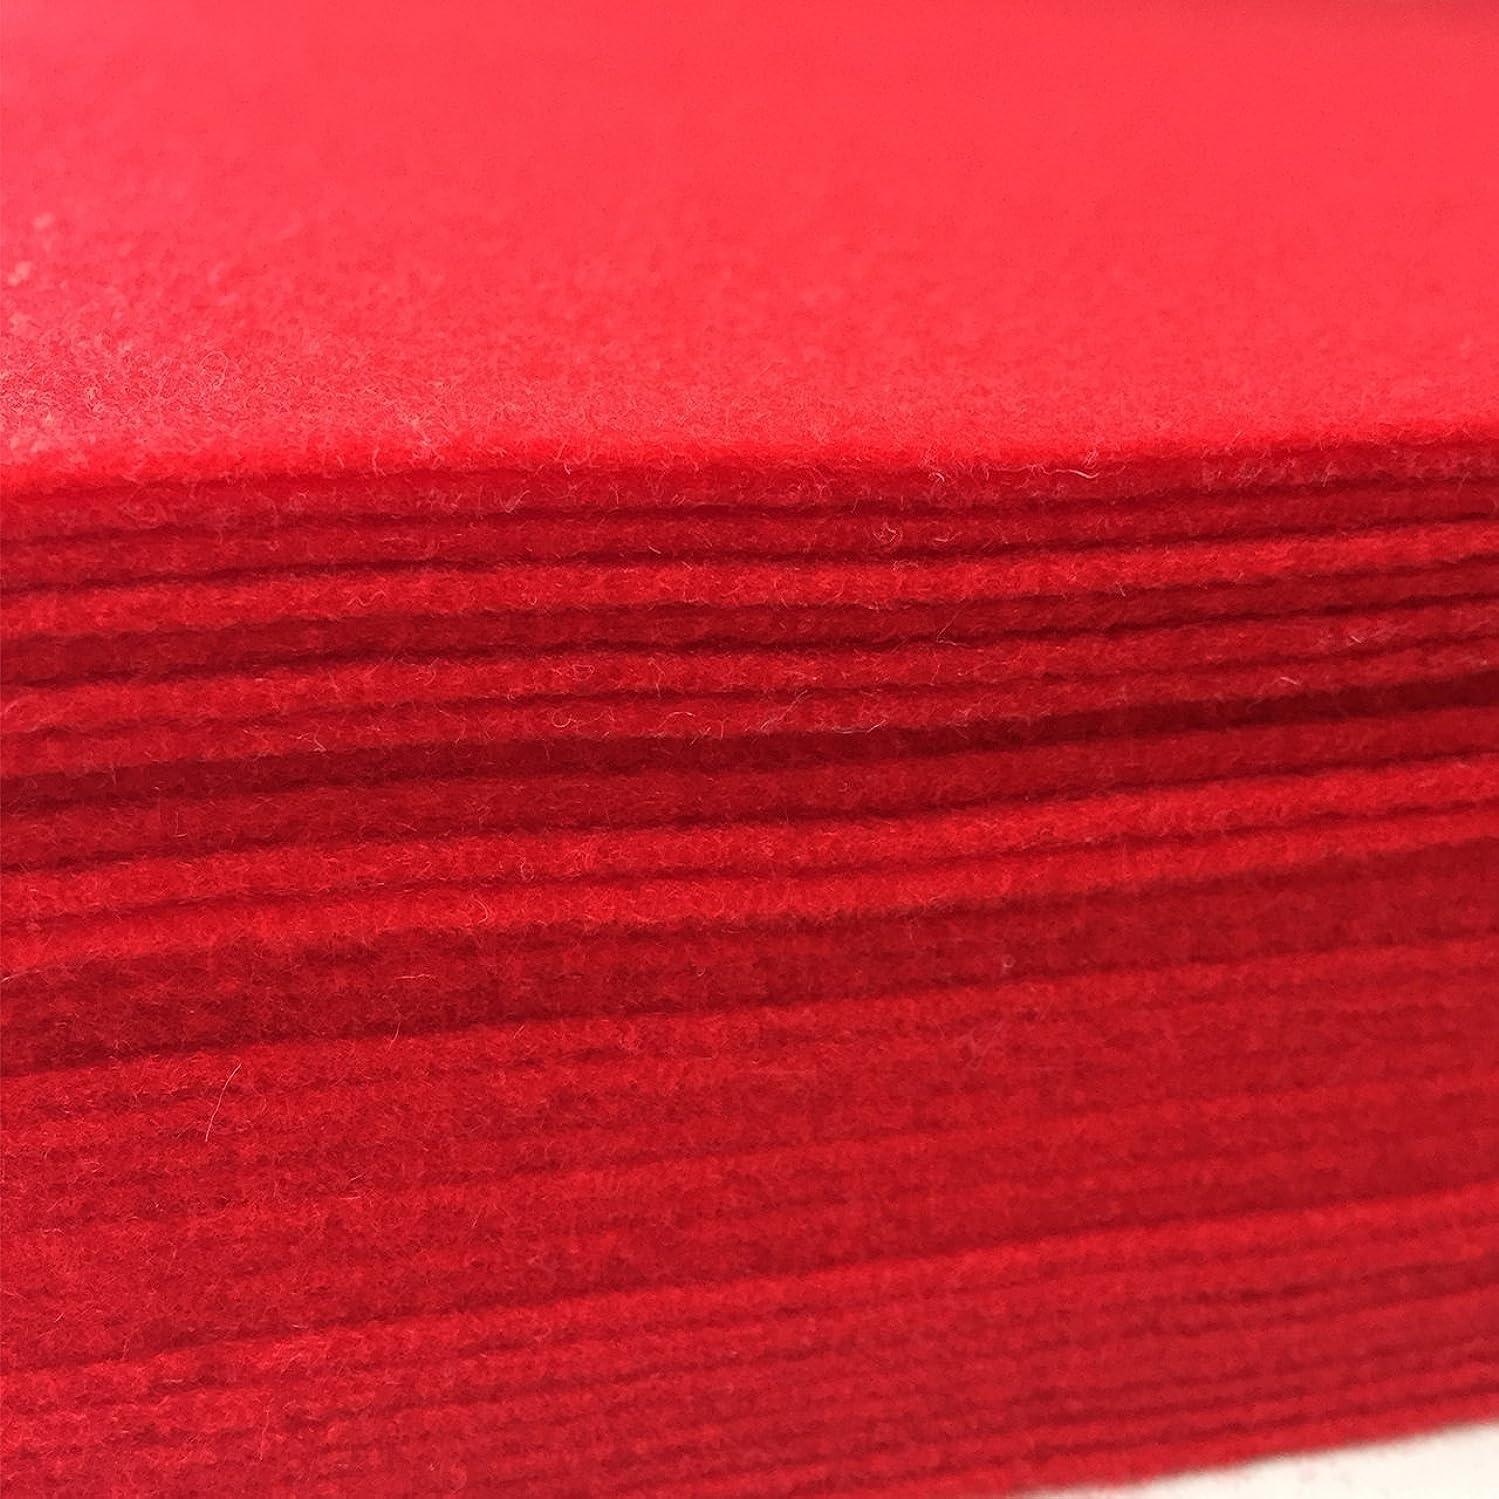 Misscrafts 30pcs 12 X 12 Inches 1.4mm Red Christmas Felt Squares Soft Christmas Felt Sheets Christmas Felt Arts and Crafts Felt Fat Quarters DIY Sewing Nonwoven Patchwork Wool Blended Felt